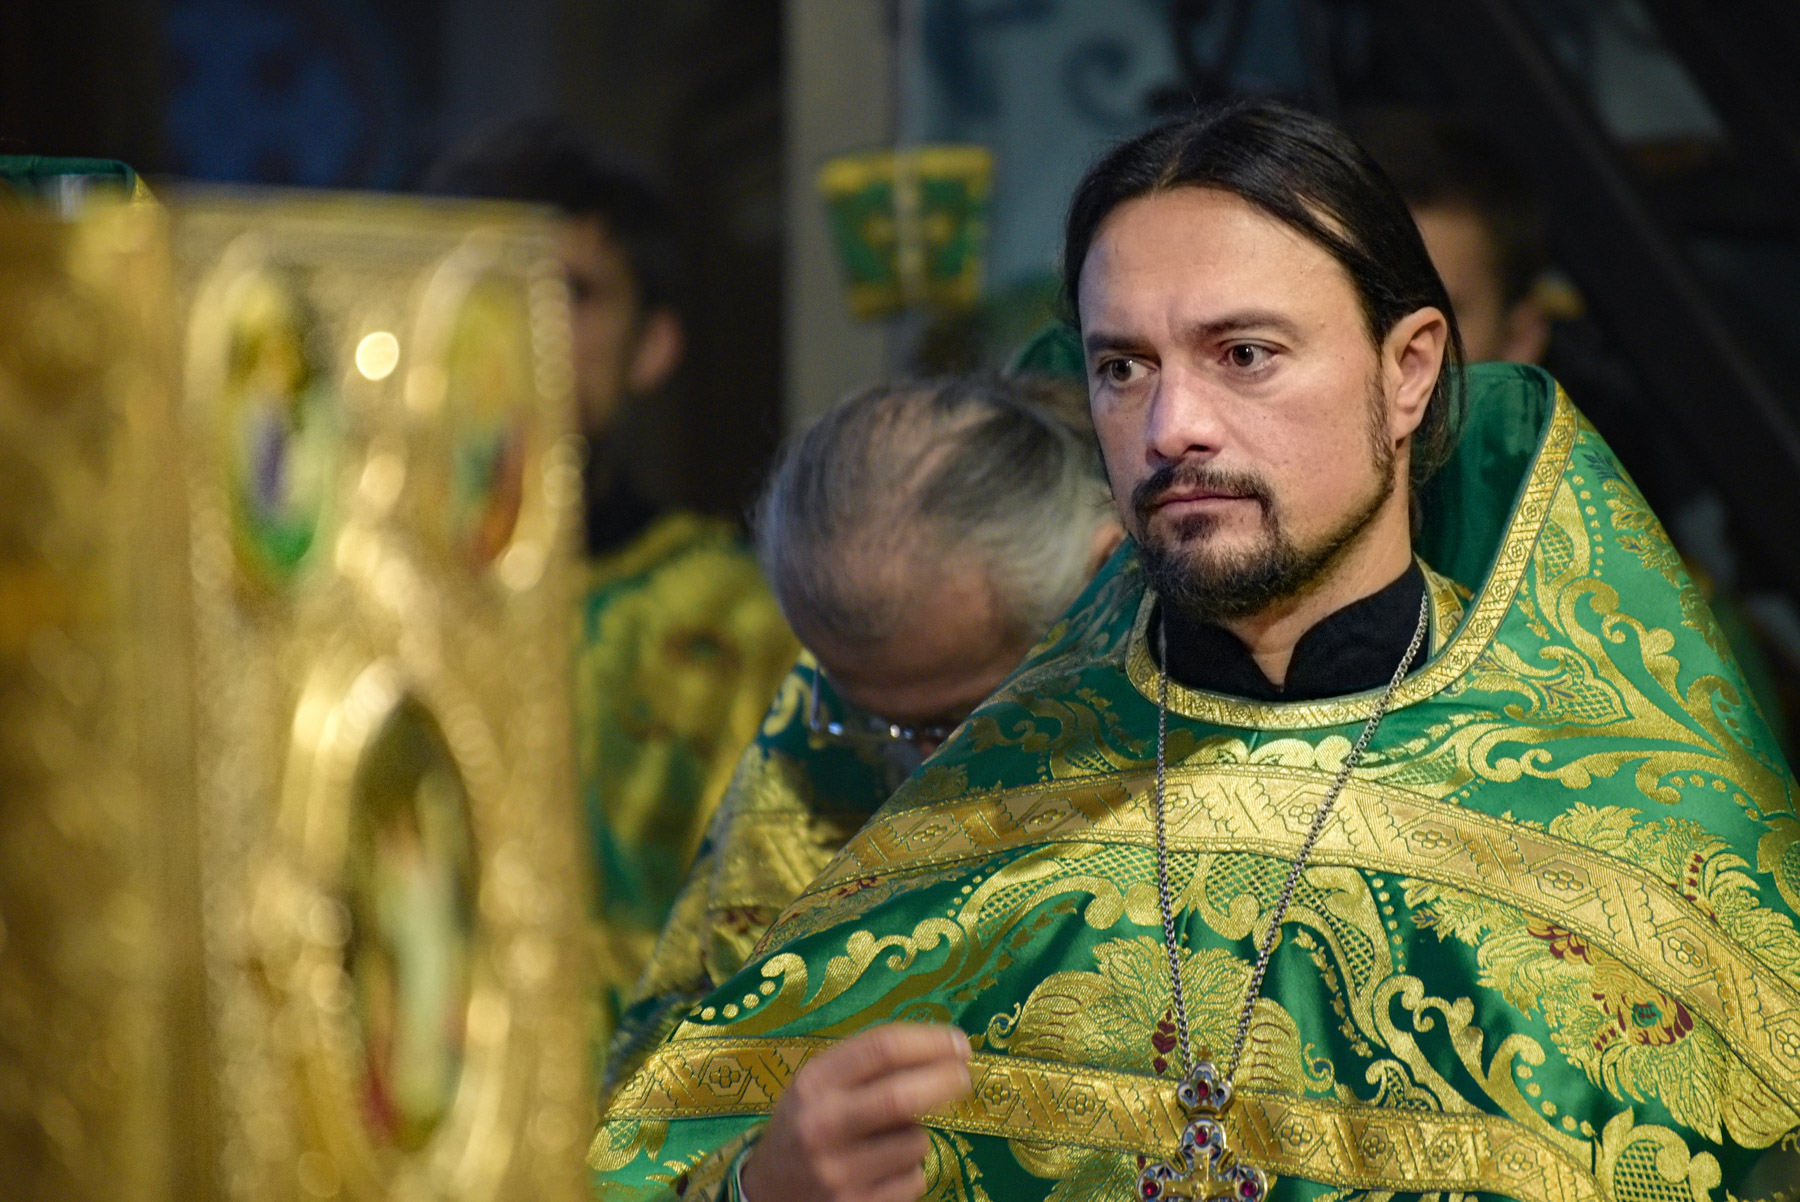 photos of orthodox christmas 0181 2